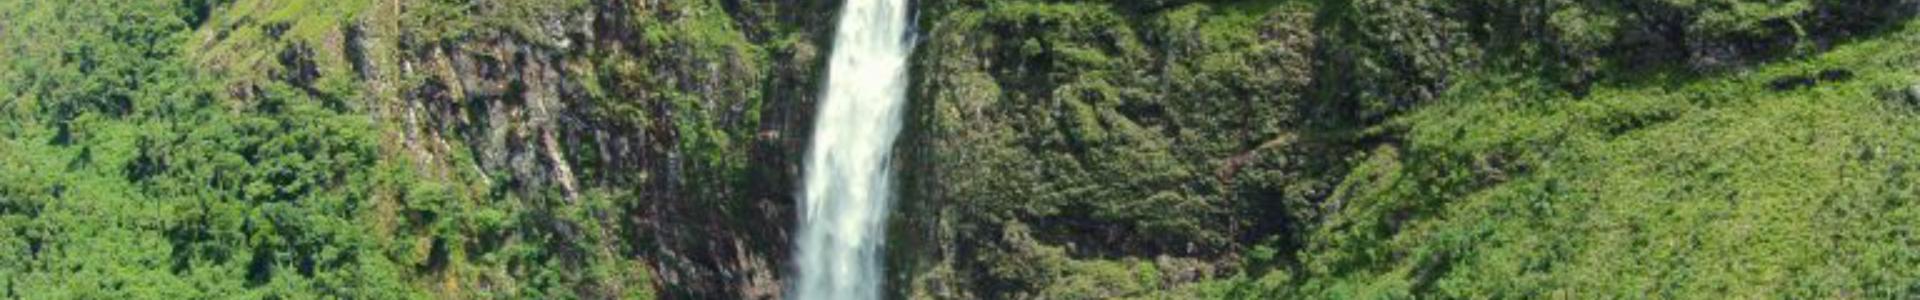 Cachoeira Casca D'Anta – Parte Alta